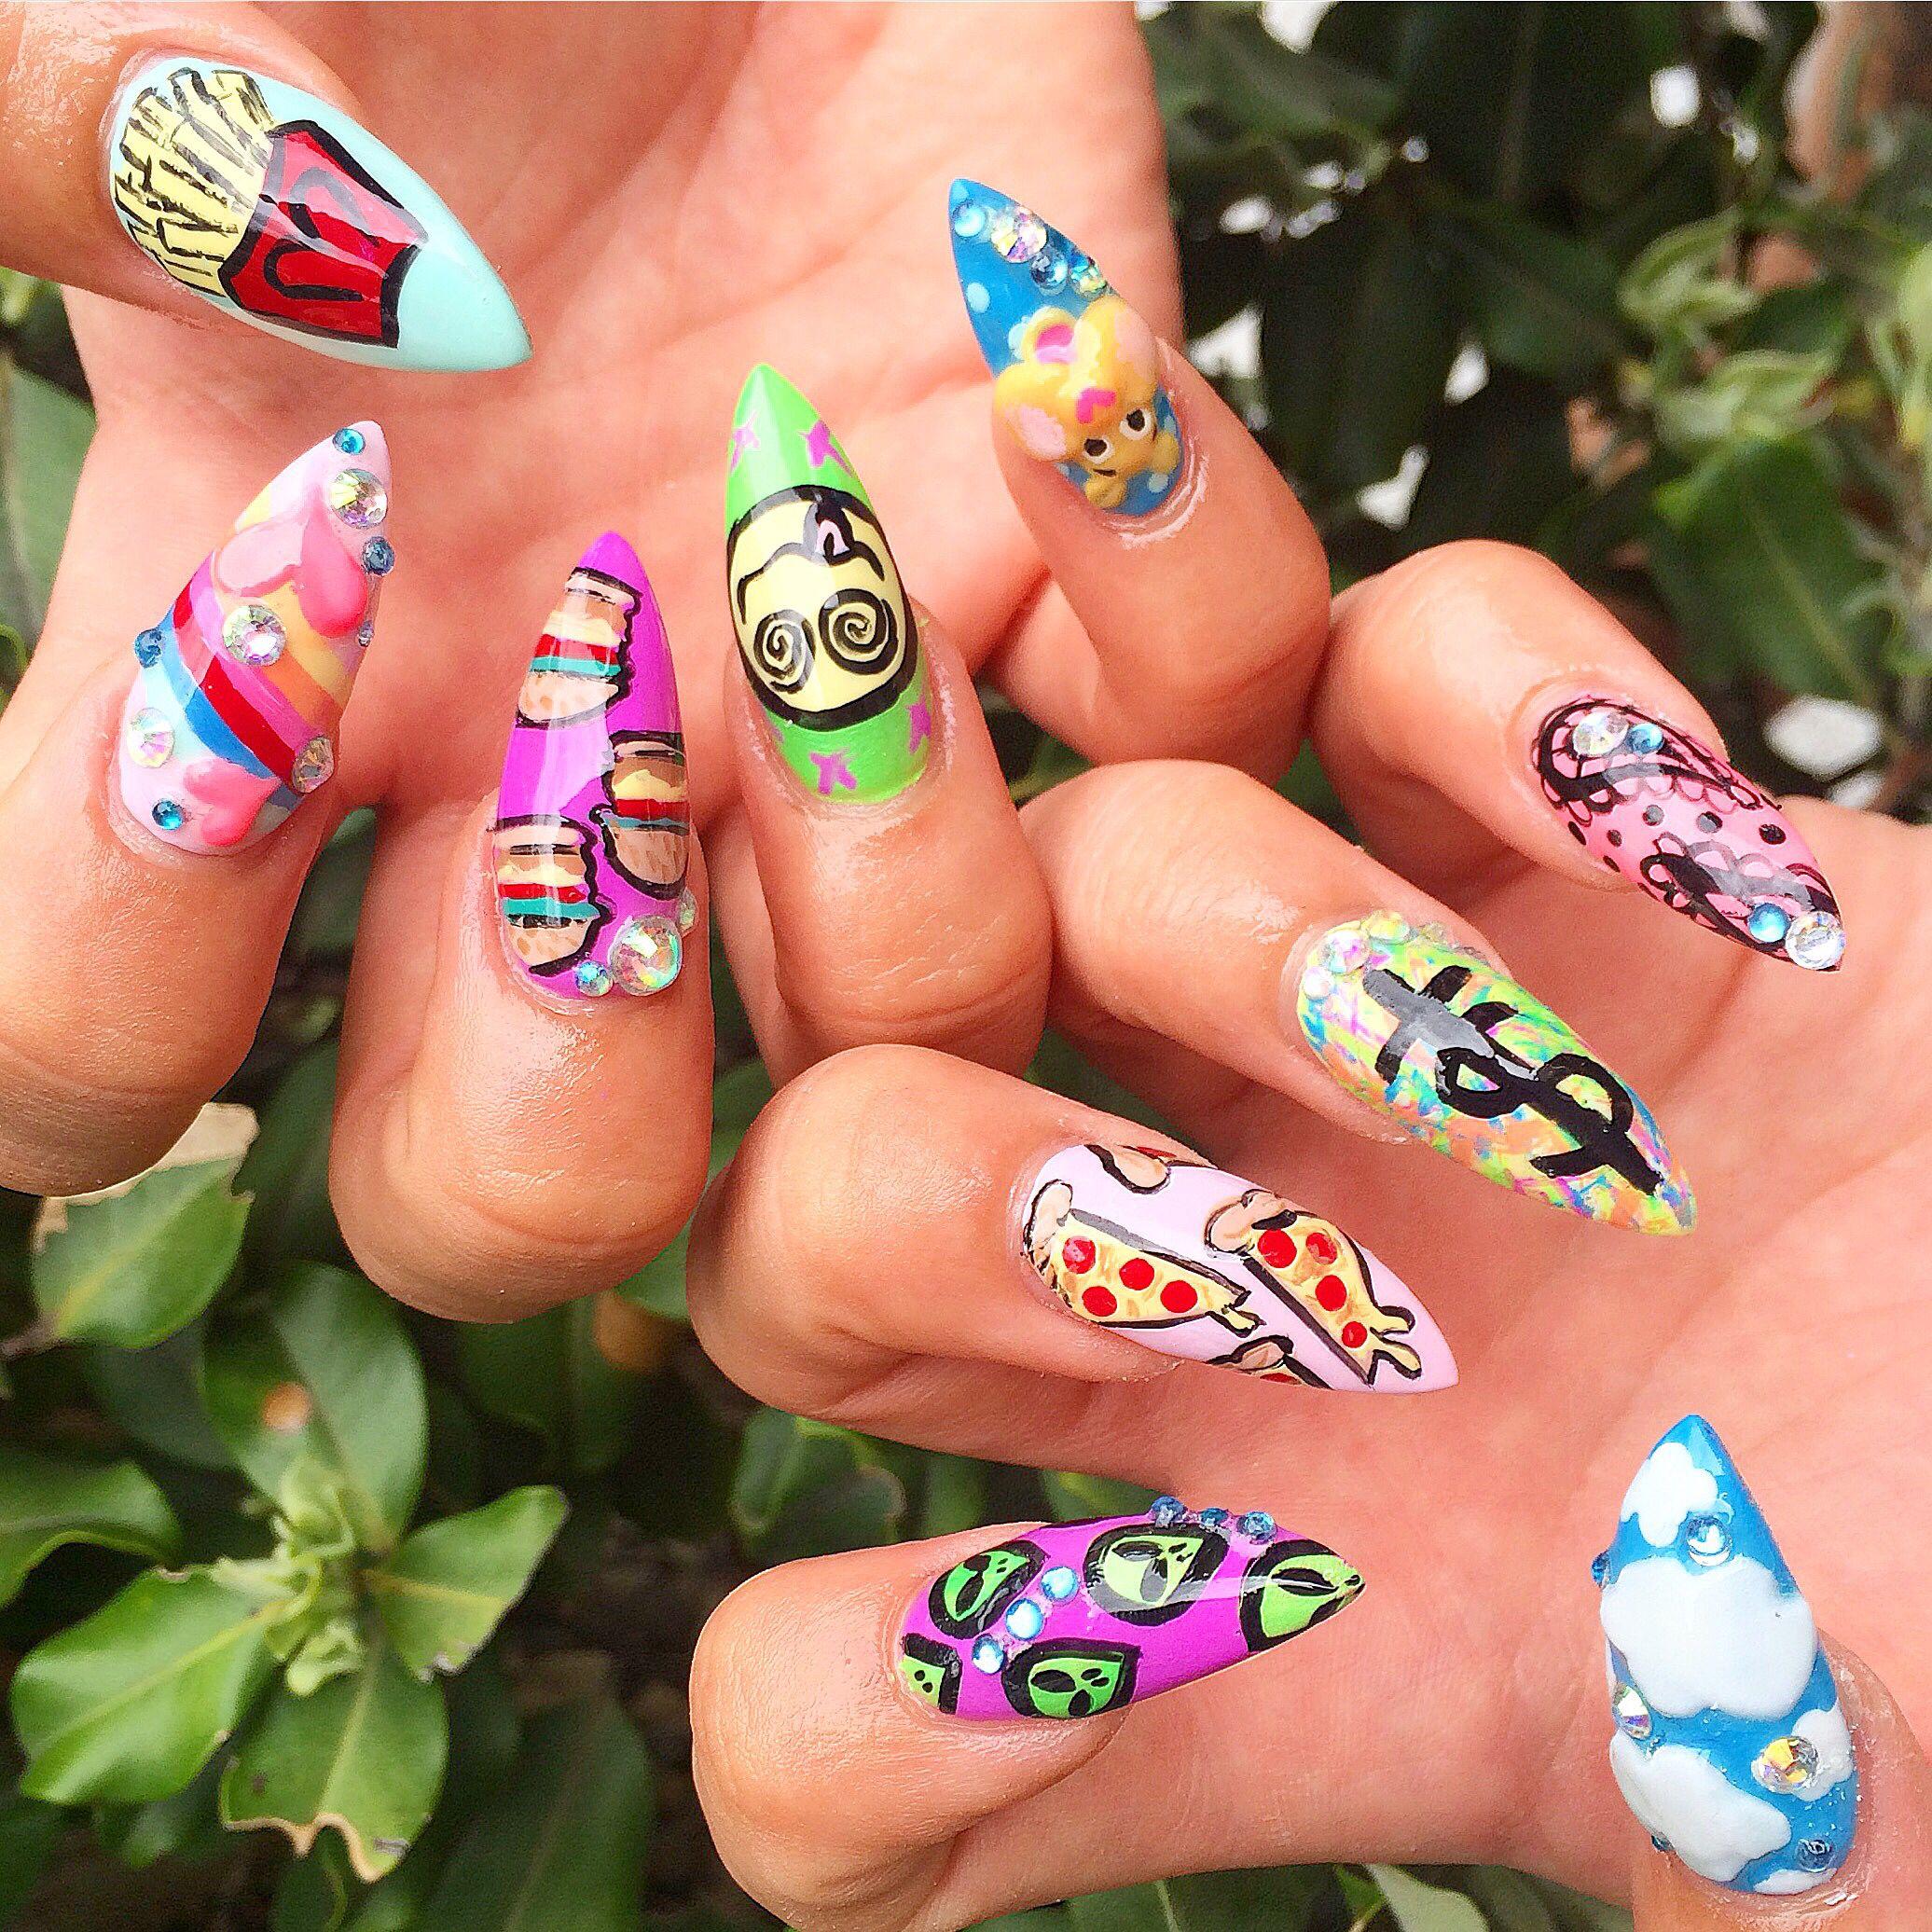 Adore dolls parlour getnailedright adoredollsparlour sexy nails prinsesfo Images